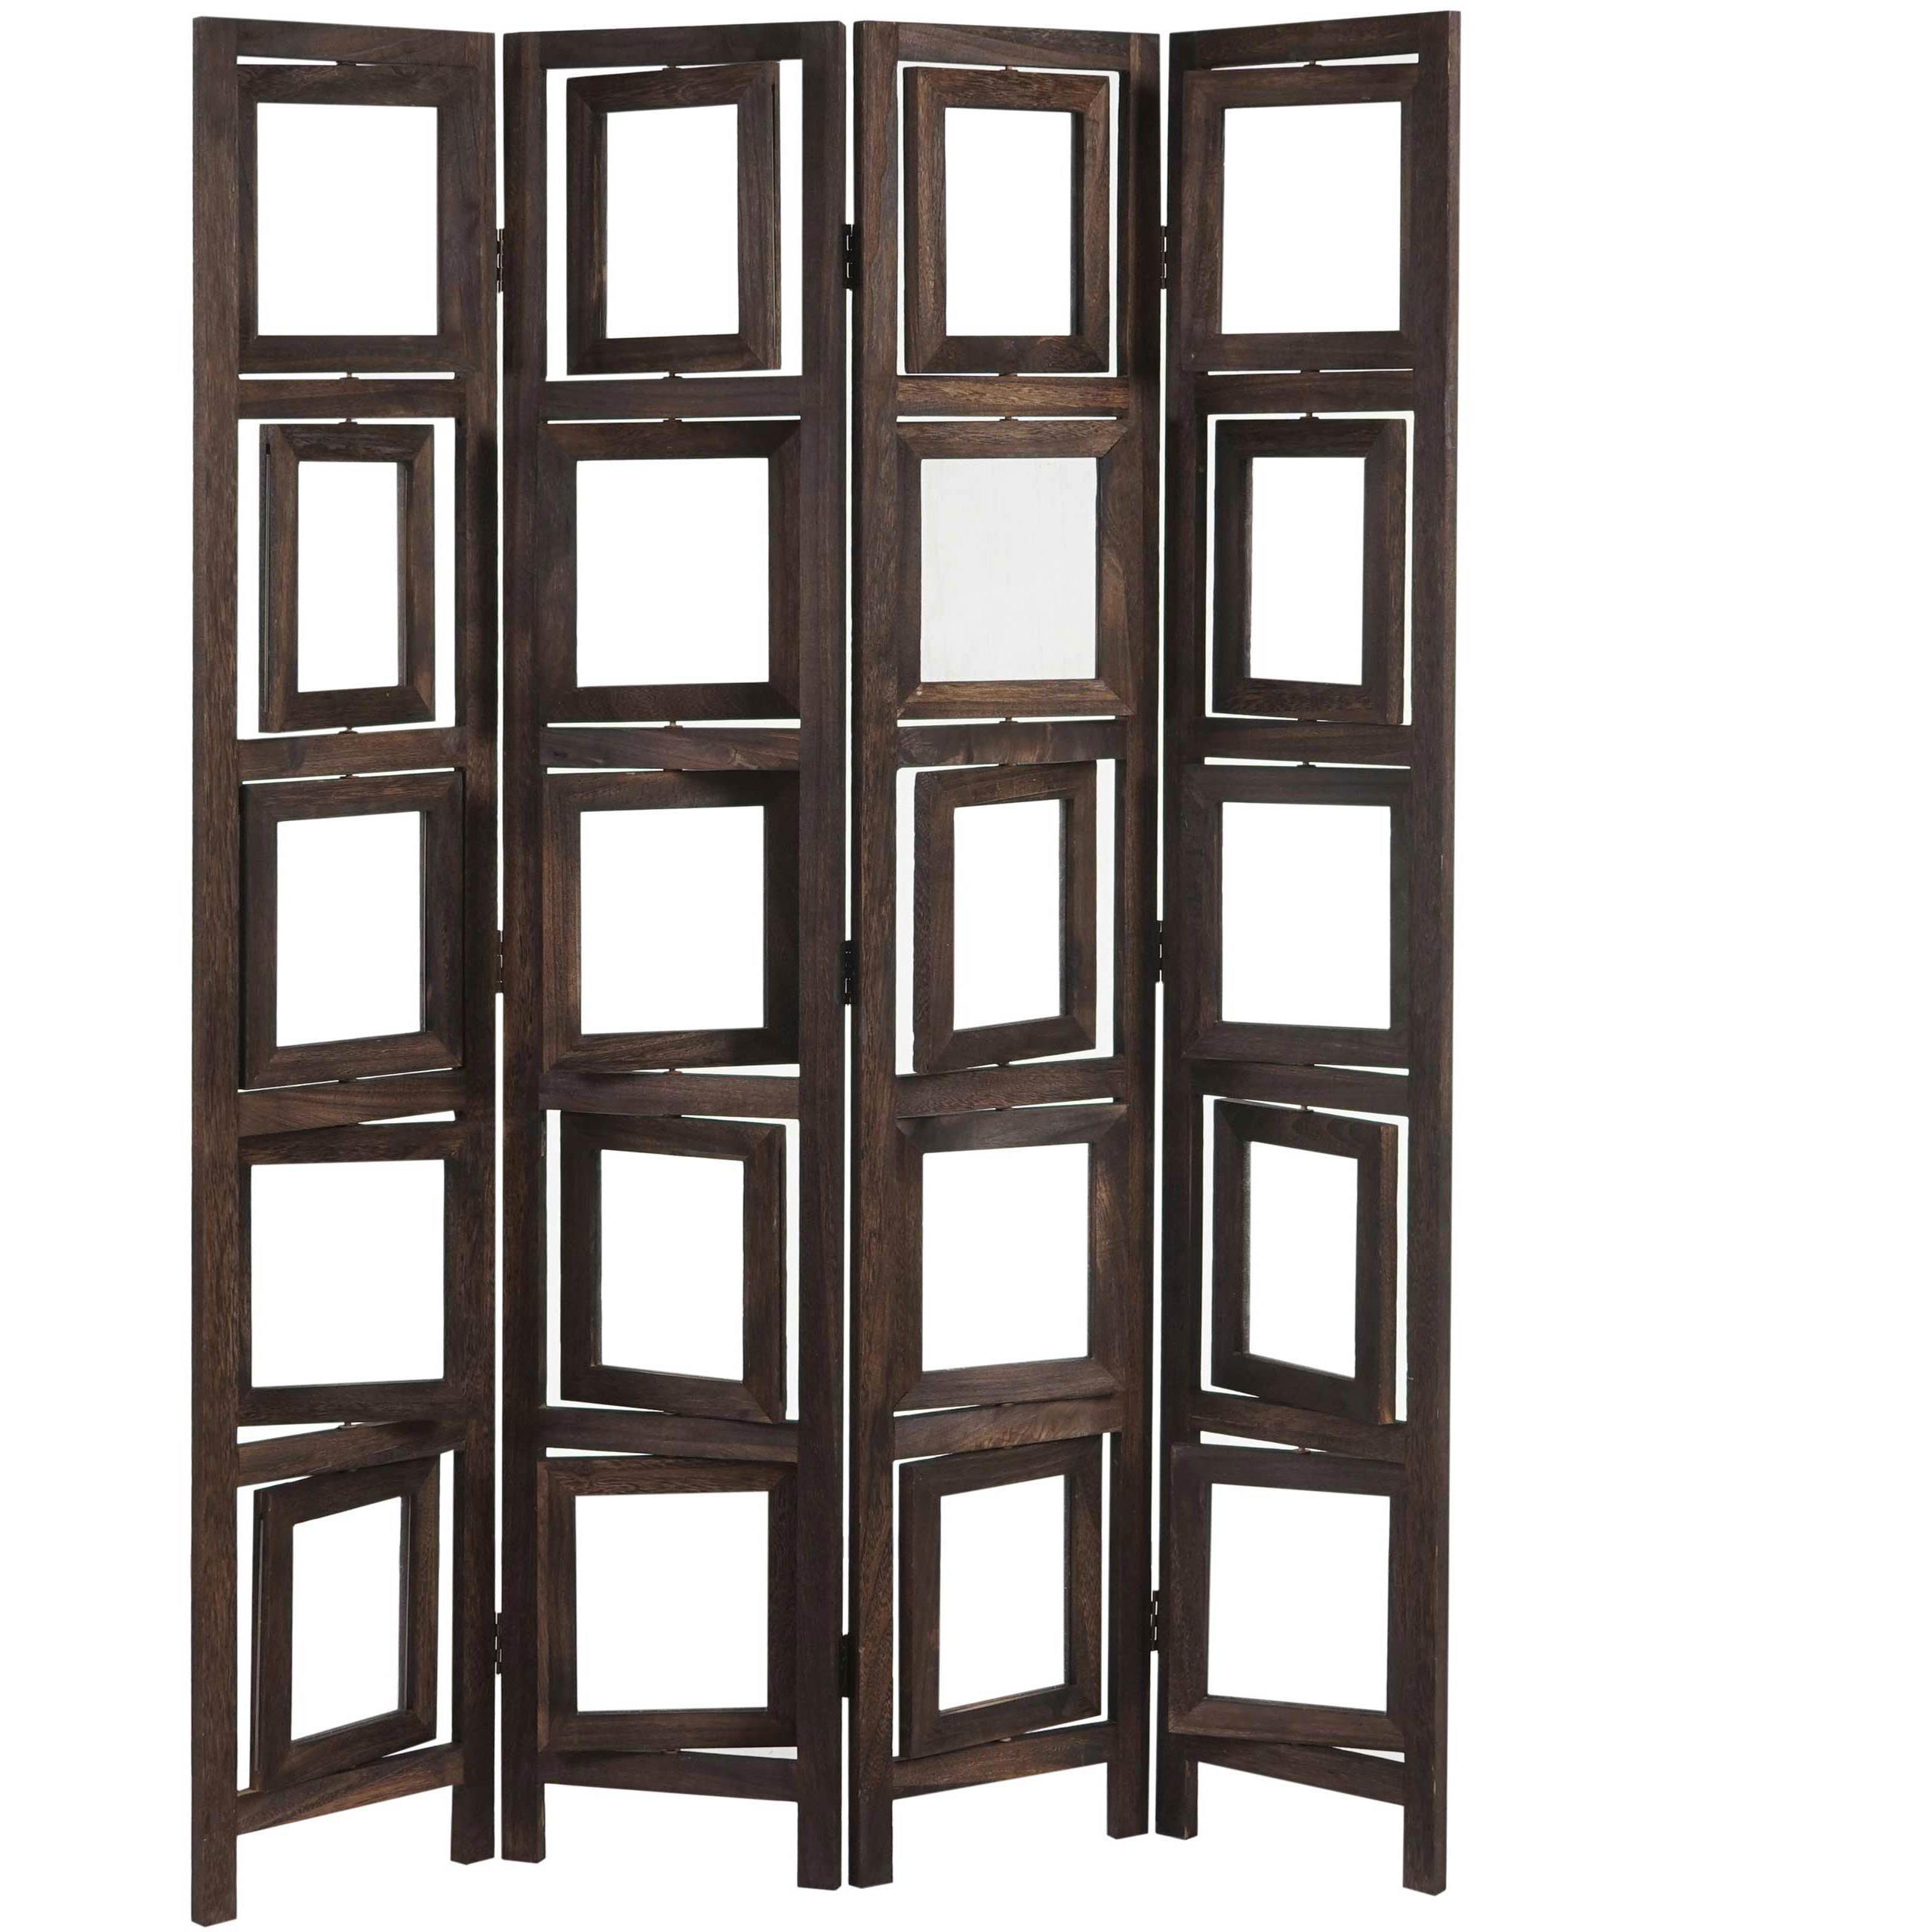 Biombo bibi estructura de madera con marcos para - Biombos de madera ...